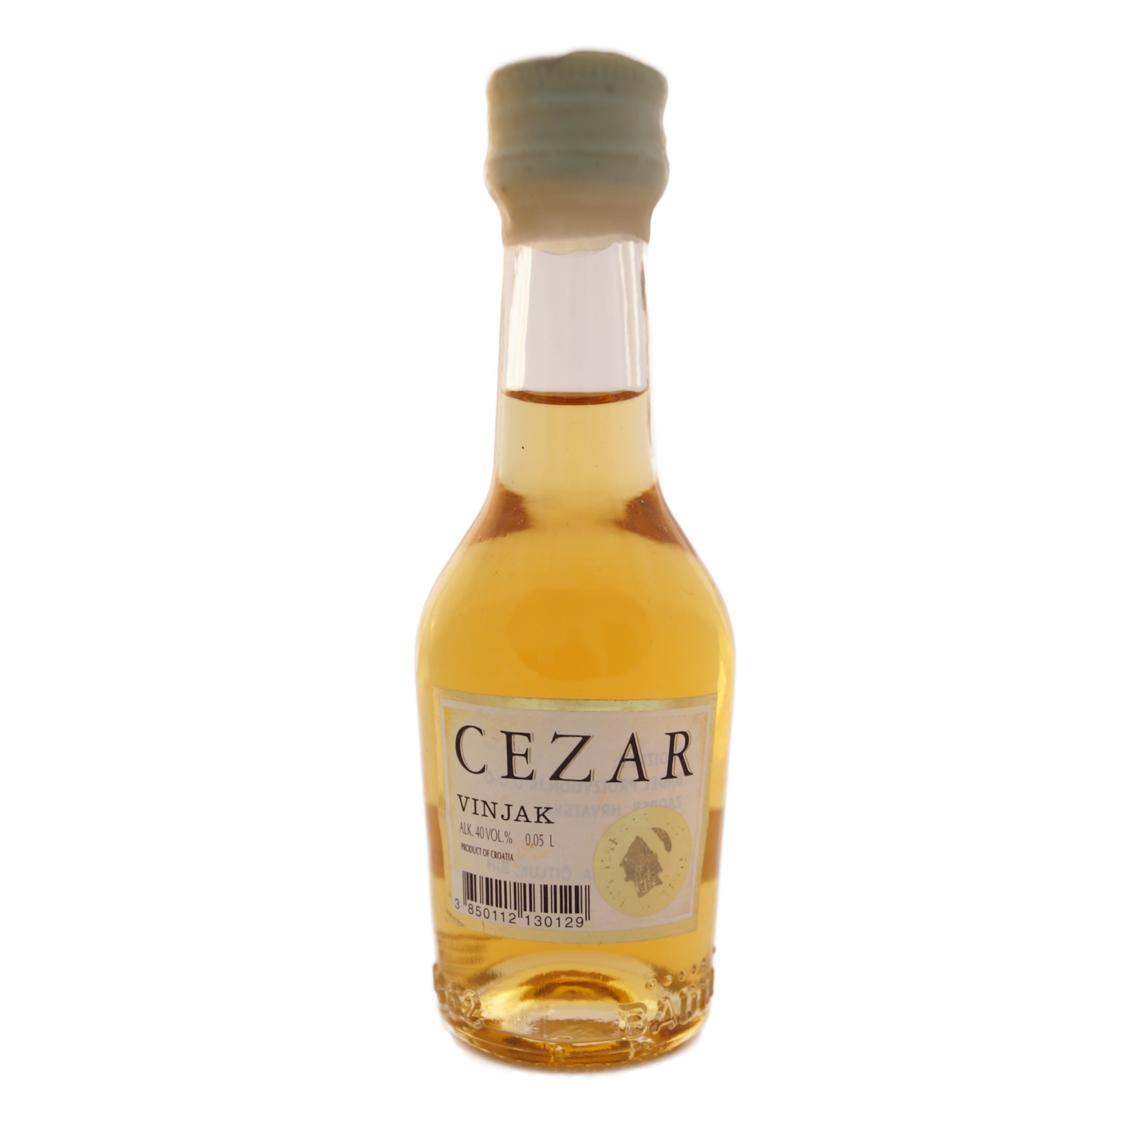 VINJAK-CEZAR